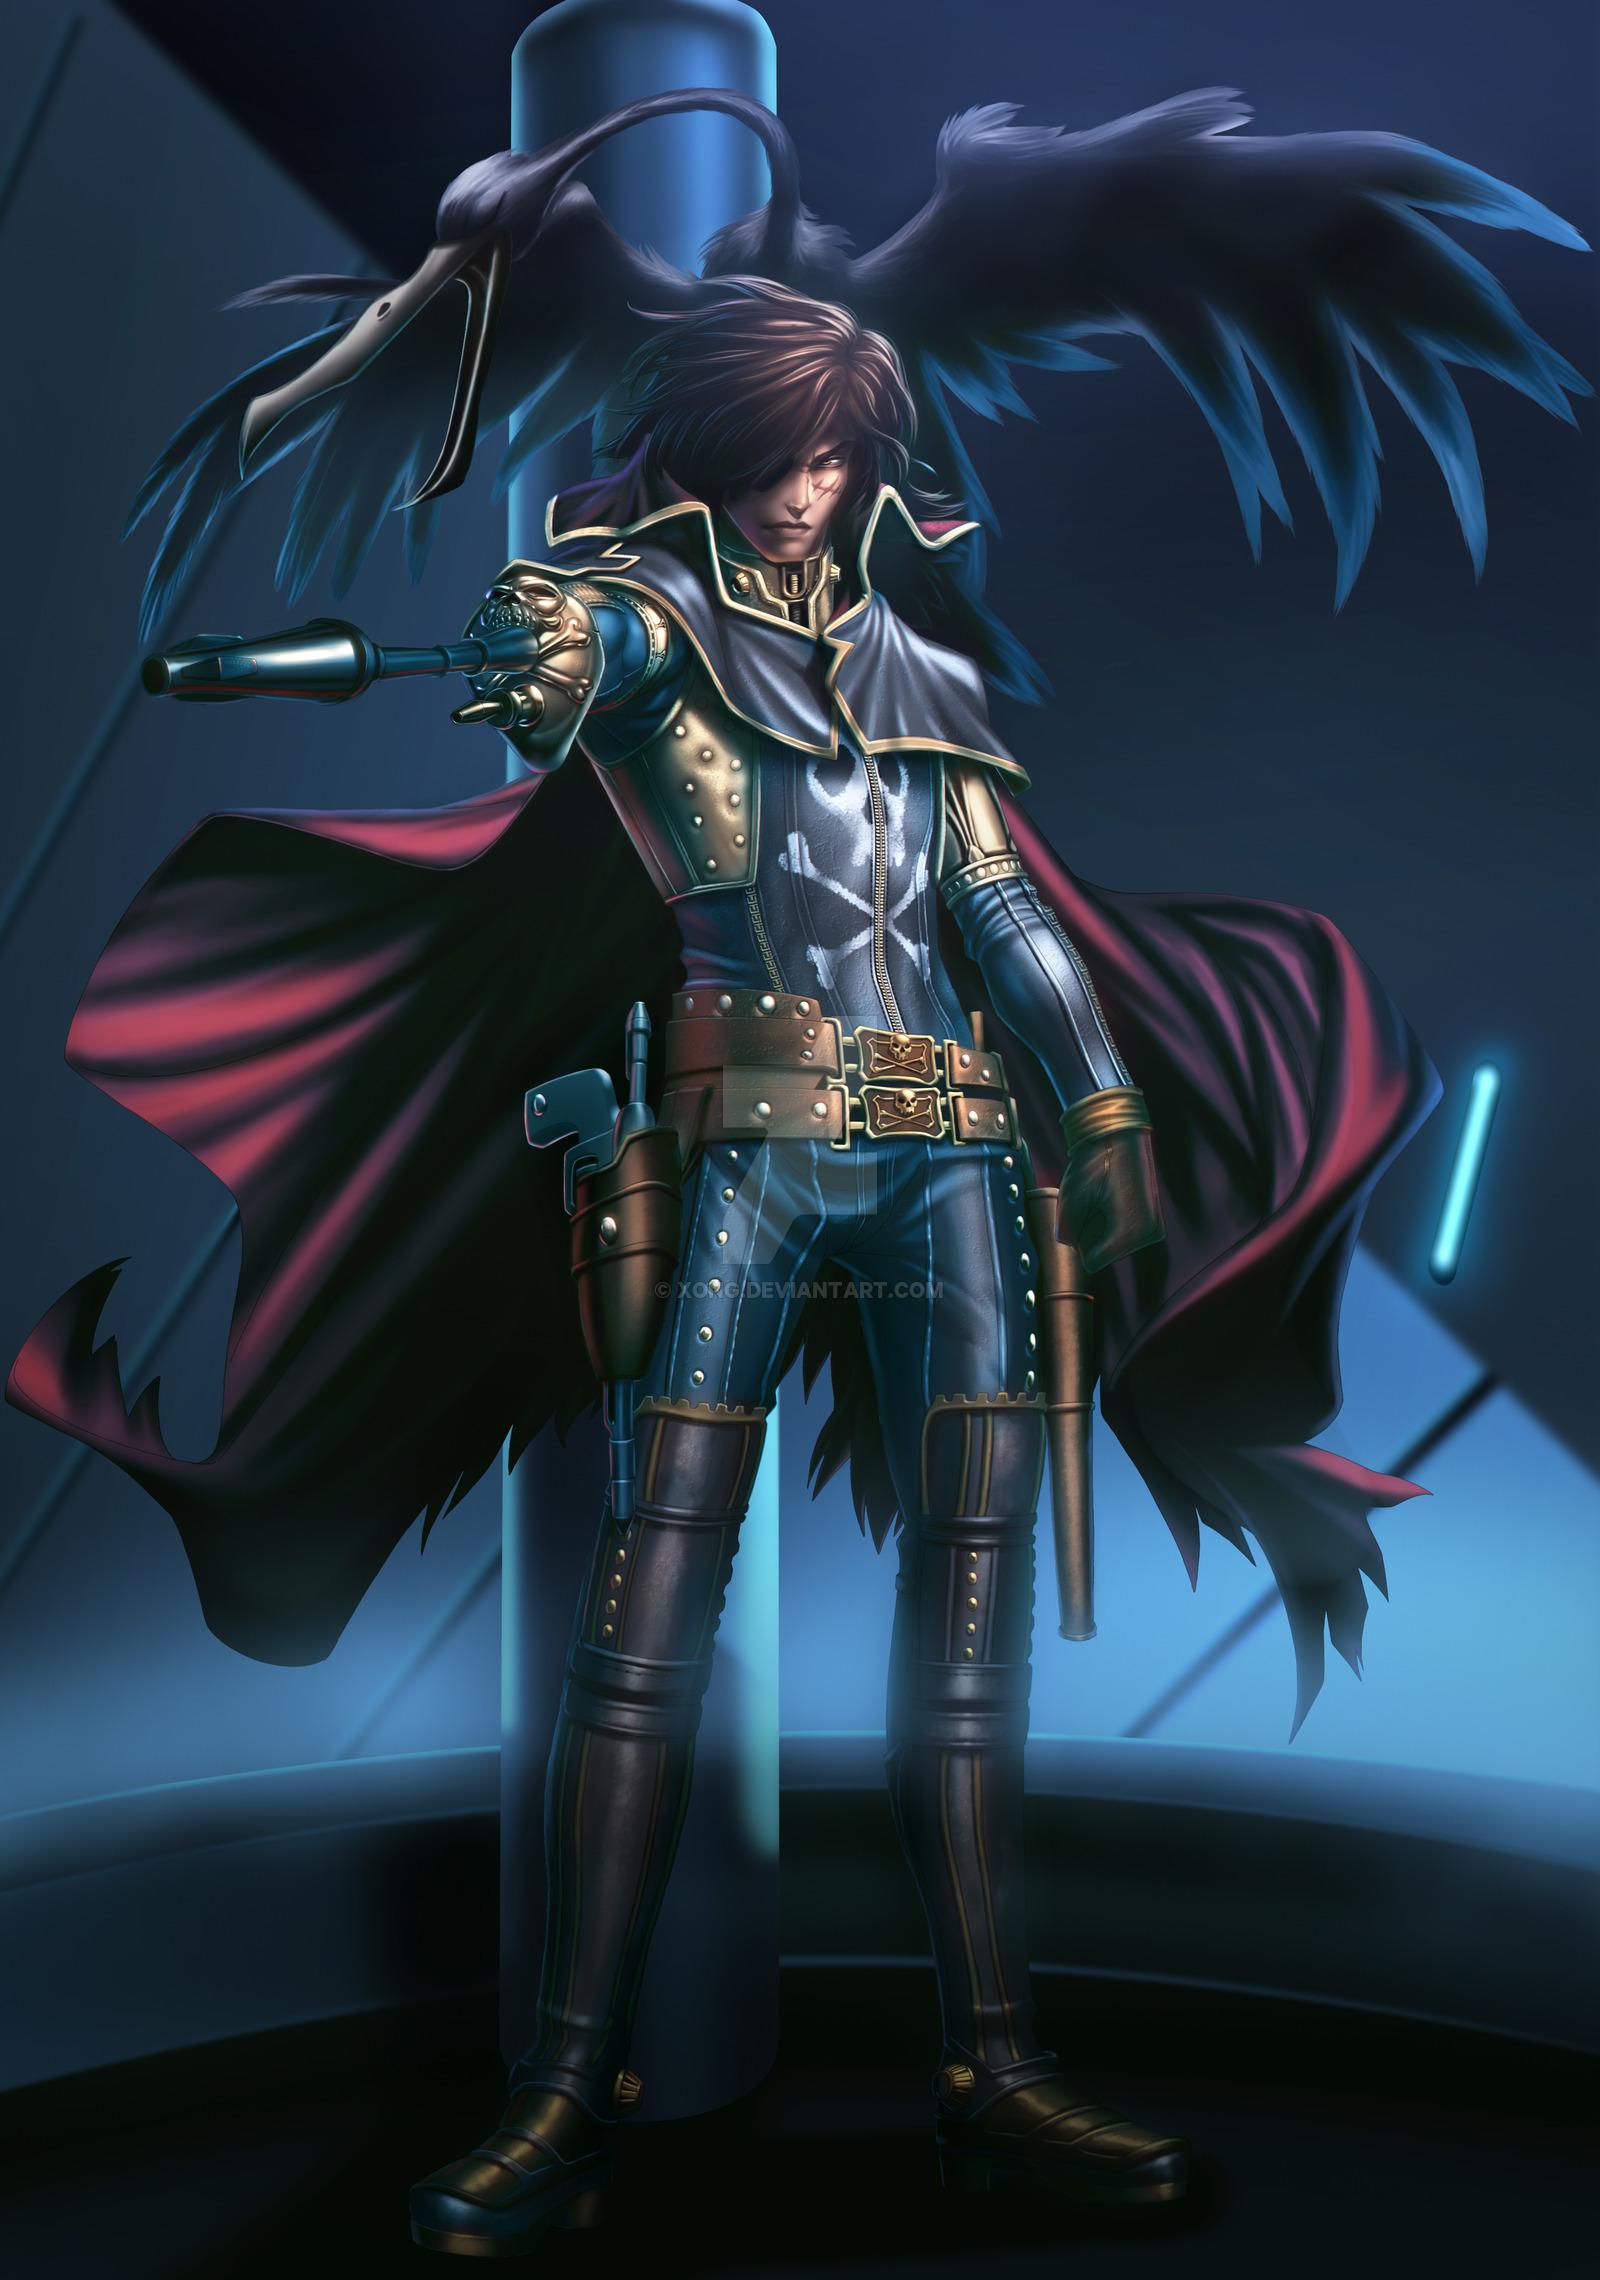 High Resolution Wallpaper | Captain Harlock 1600x2280 px